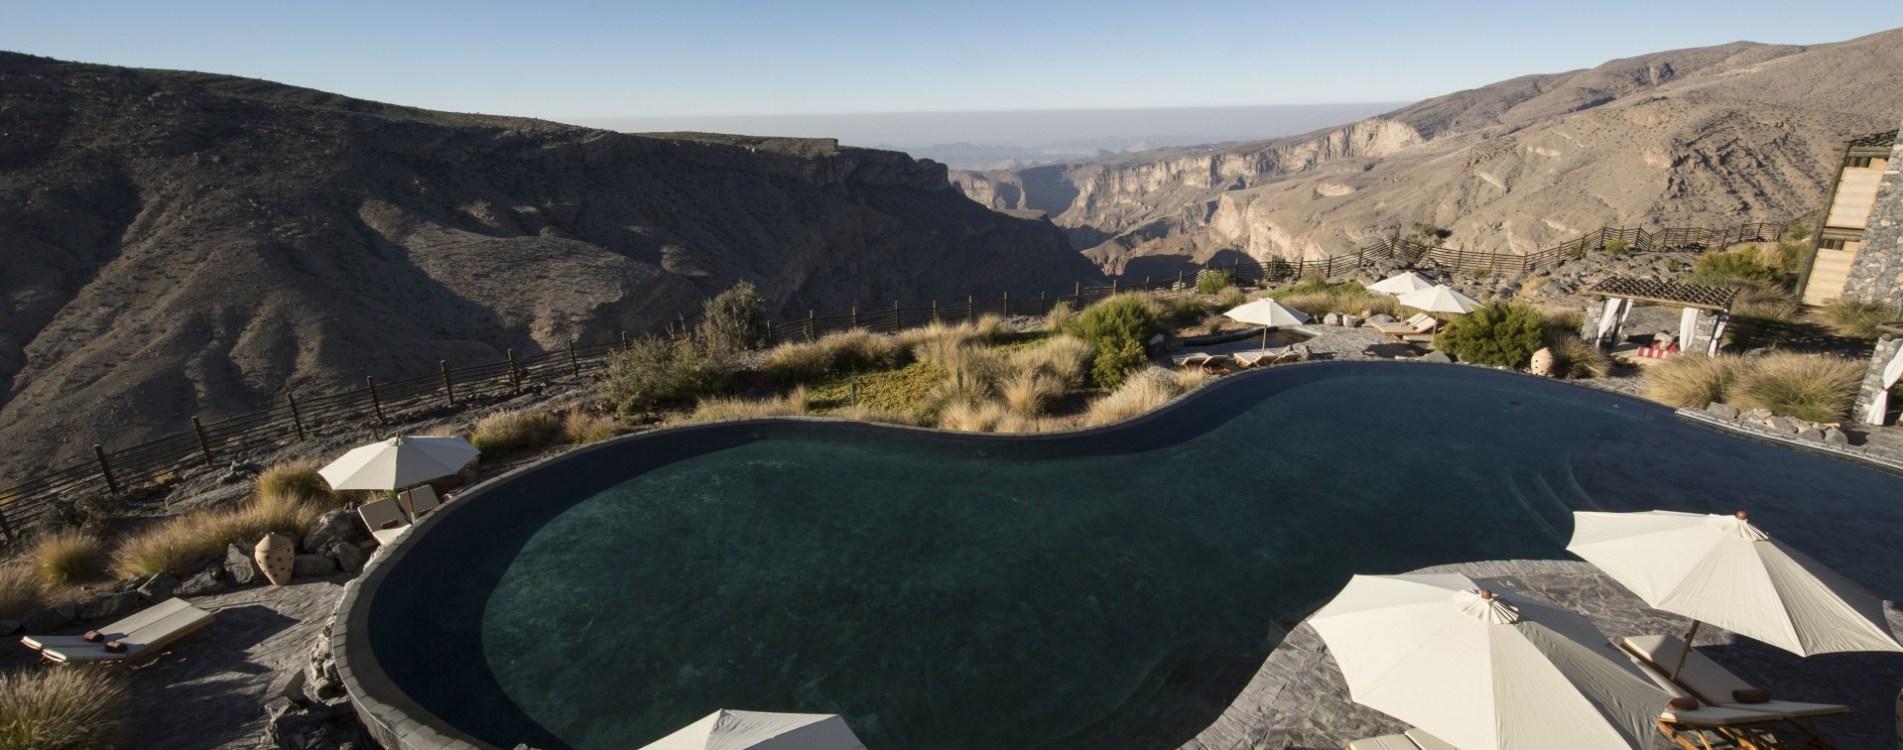 Alila-Jabal-Akhdar-Infinity-Pool-Luftbildaufnahme-Oman.JPG